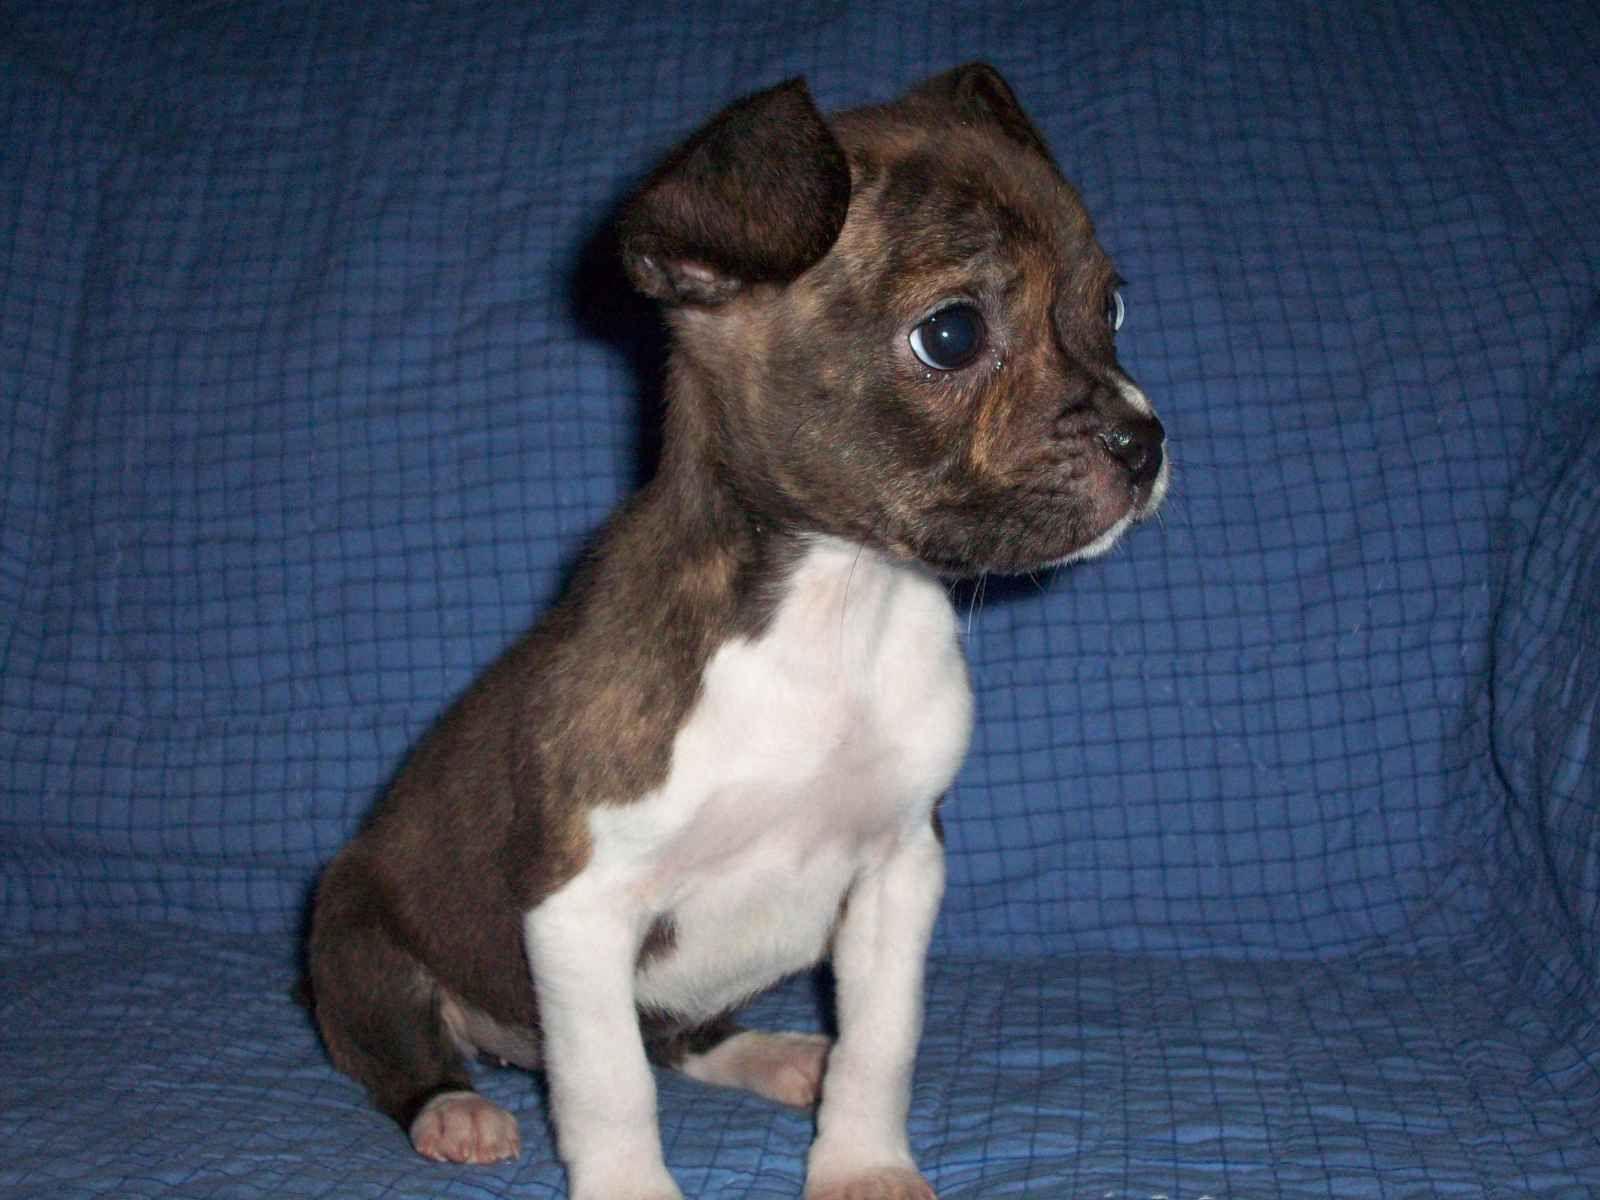 Its A Boogle A Mix Between Boston Terrior And A Beagle So Cute